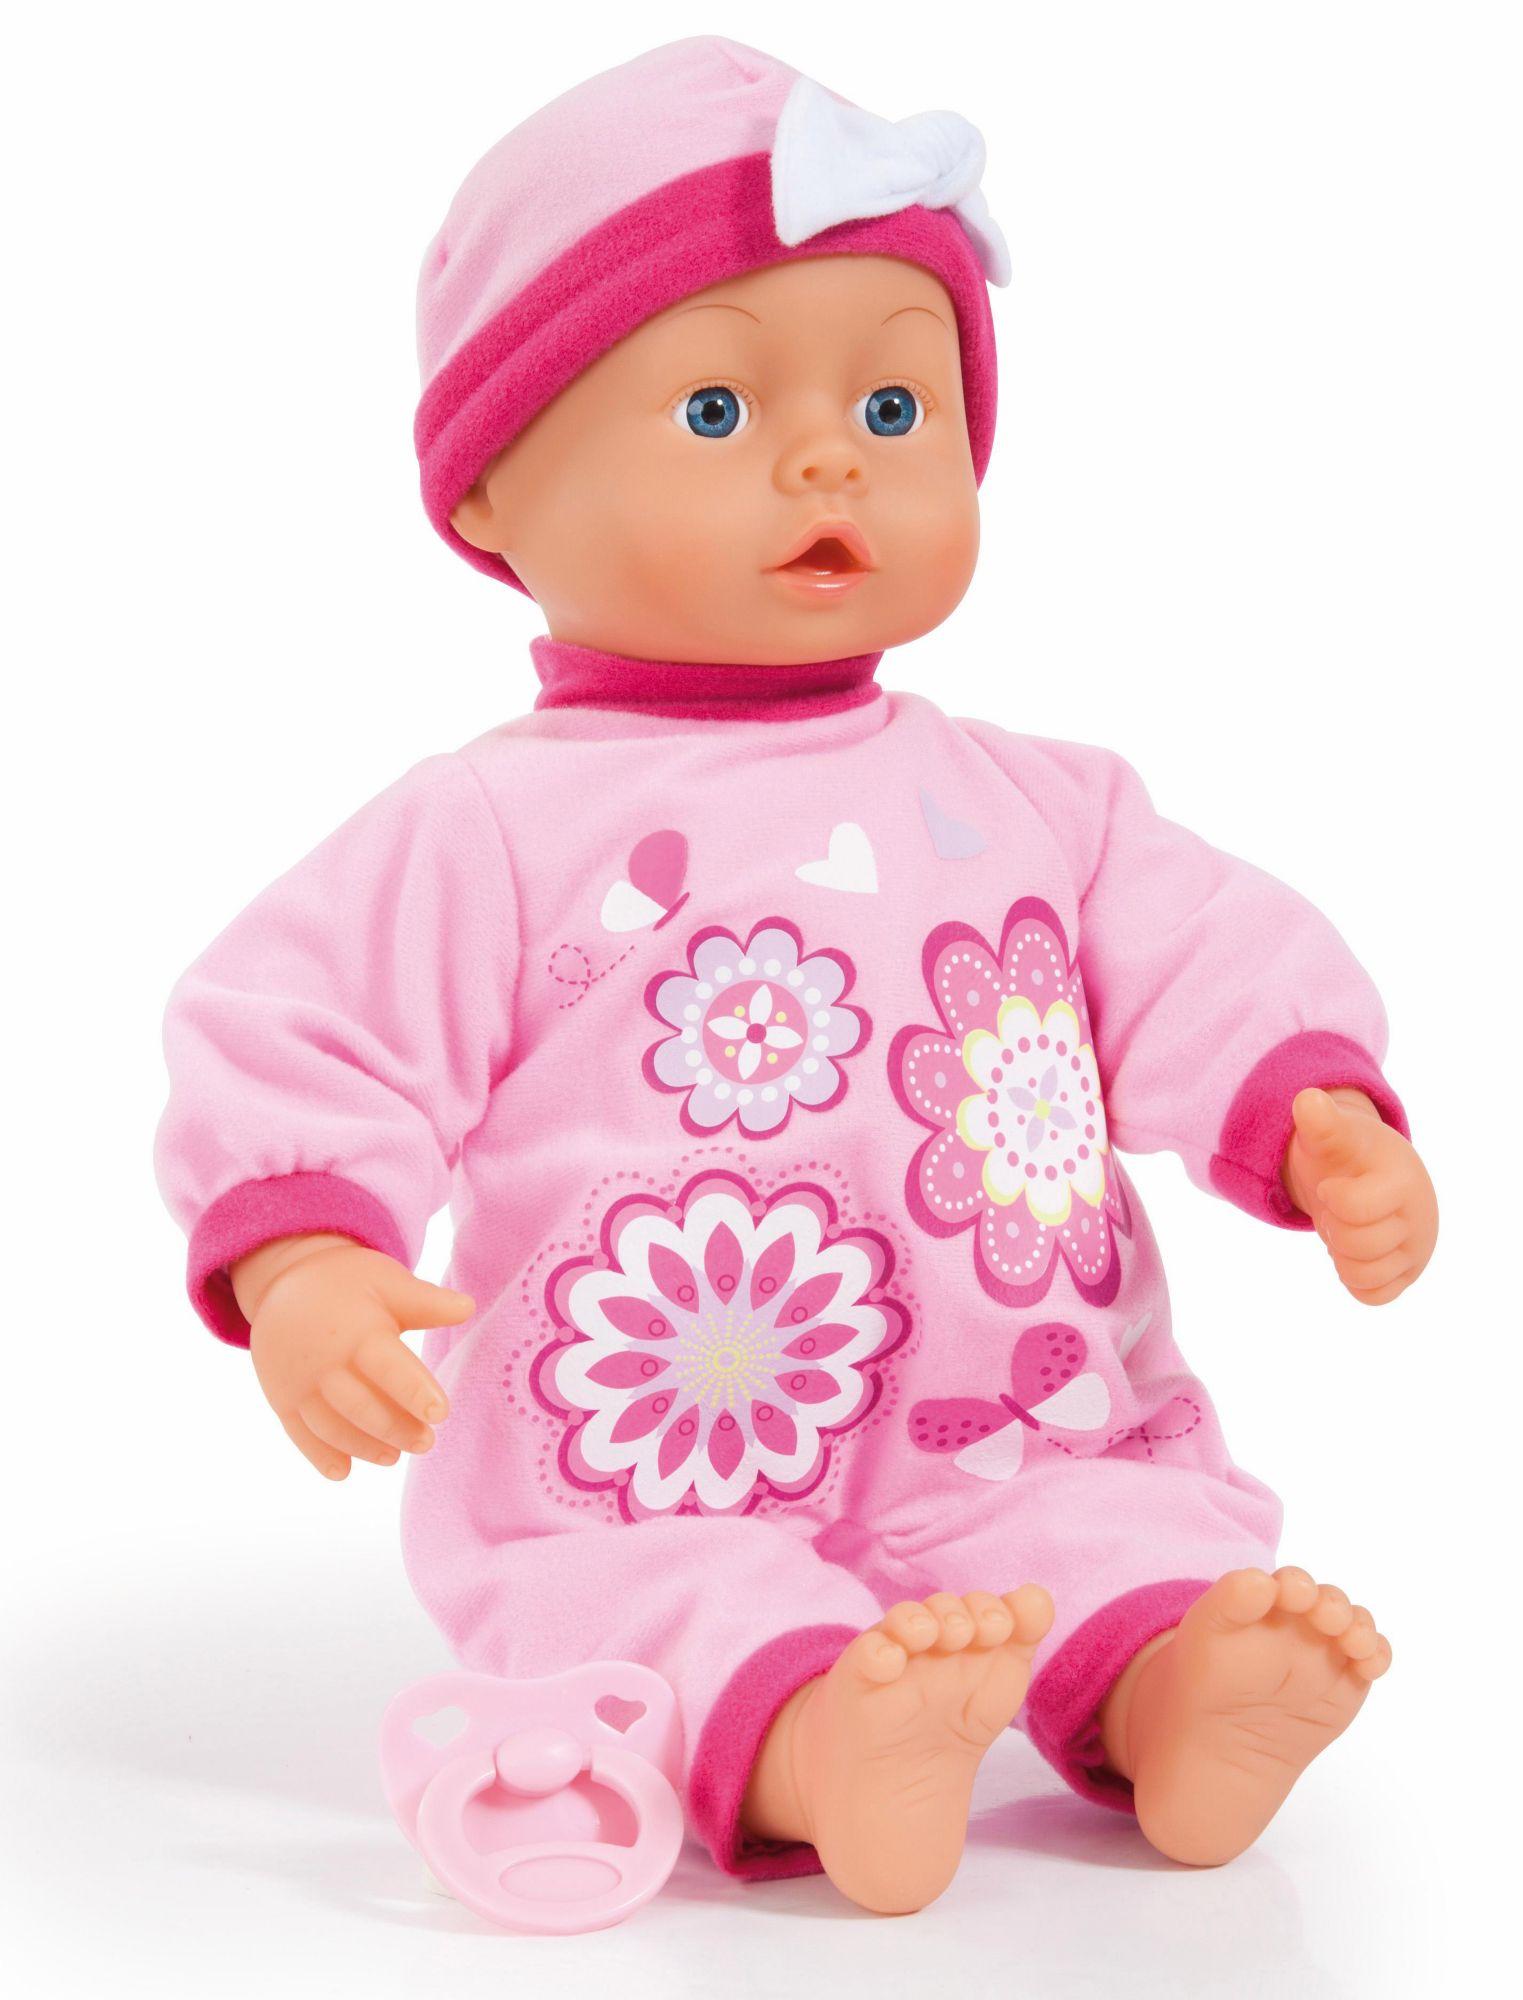 BAYER Bayer Design Babypuppe mit Funktion, »First Words Baby, rosa 38 cm«